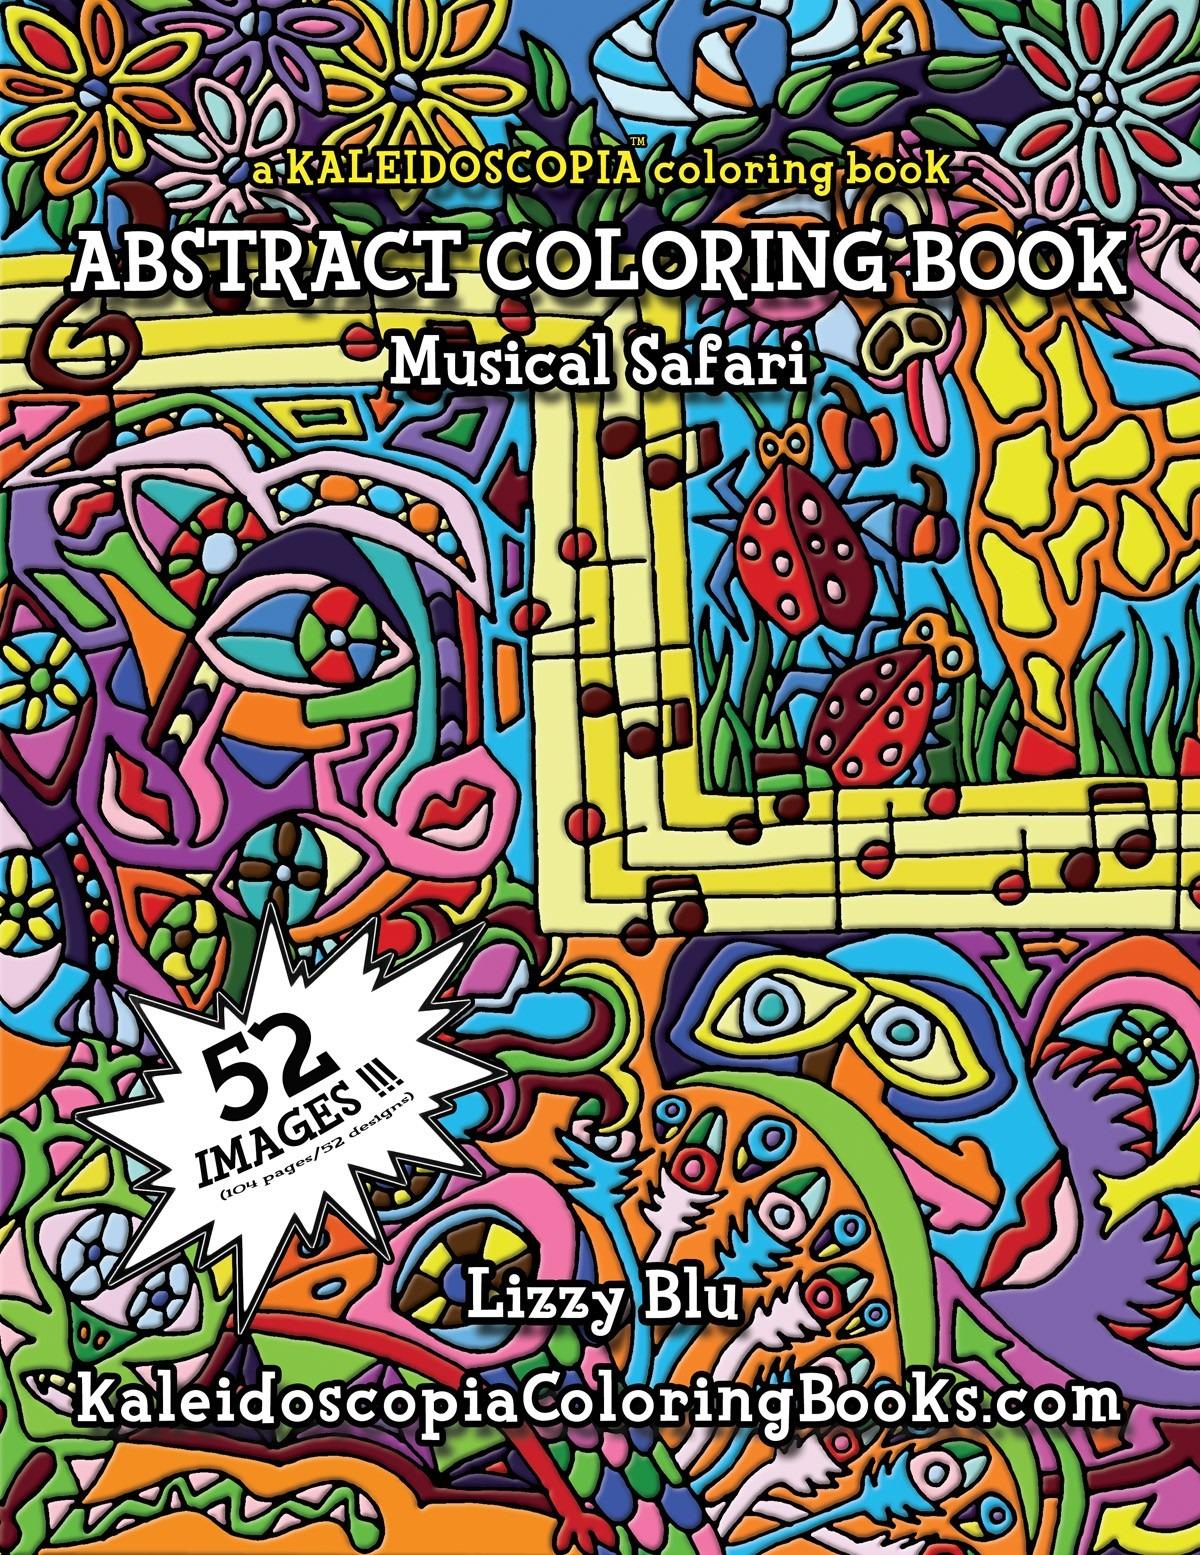 Musical Safari  An Abstract Coloring Book